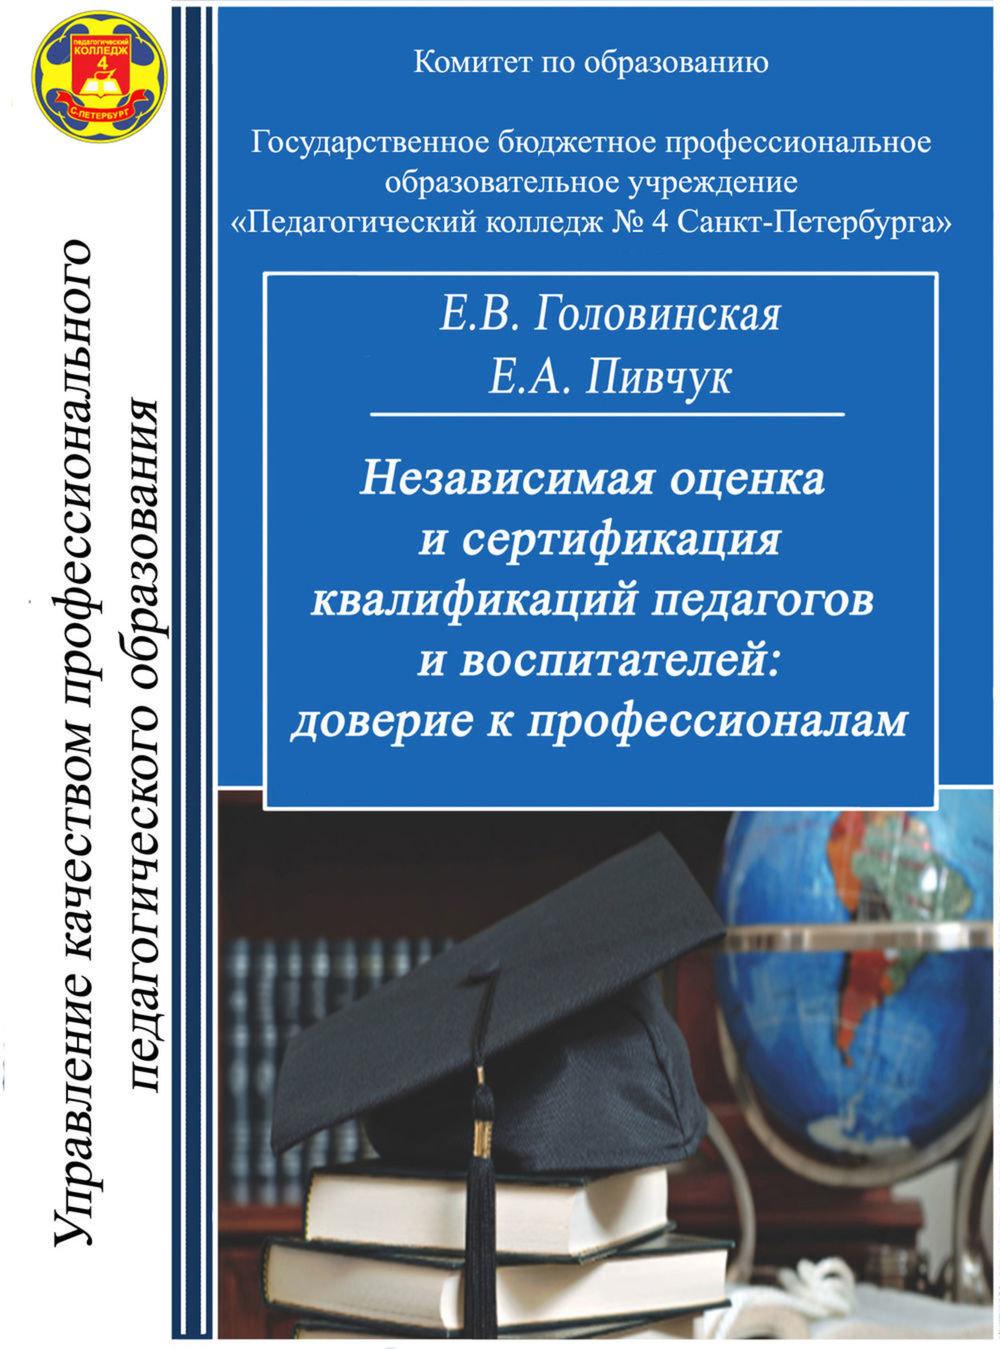 Финляндский округ Санкт-Петербург - b793707a488